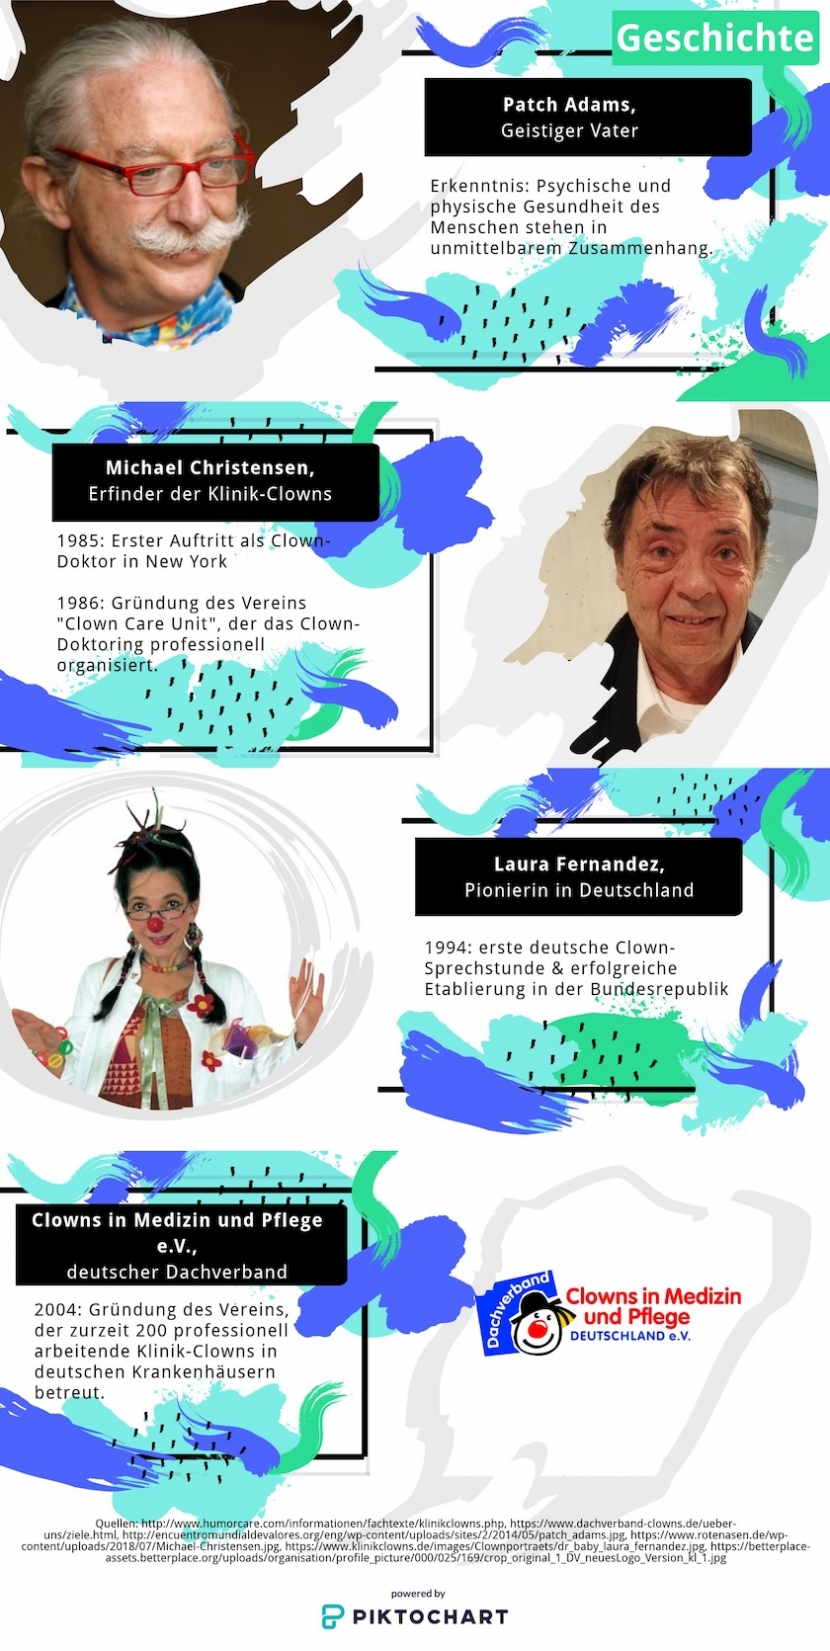 Infografik zur Geschichte der Klinik-Clowns